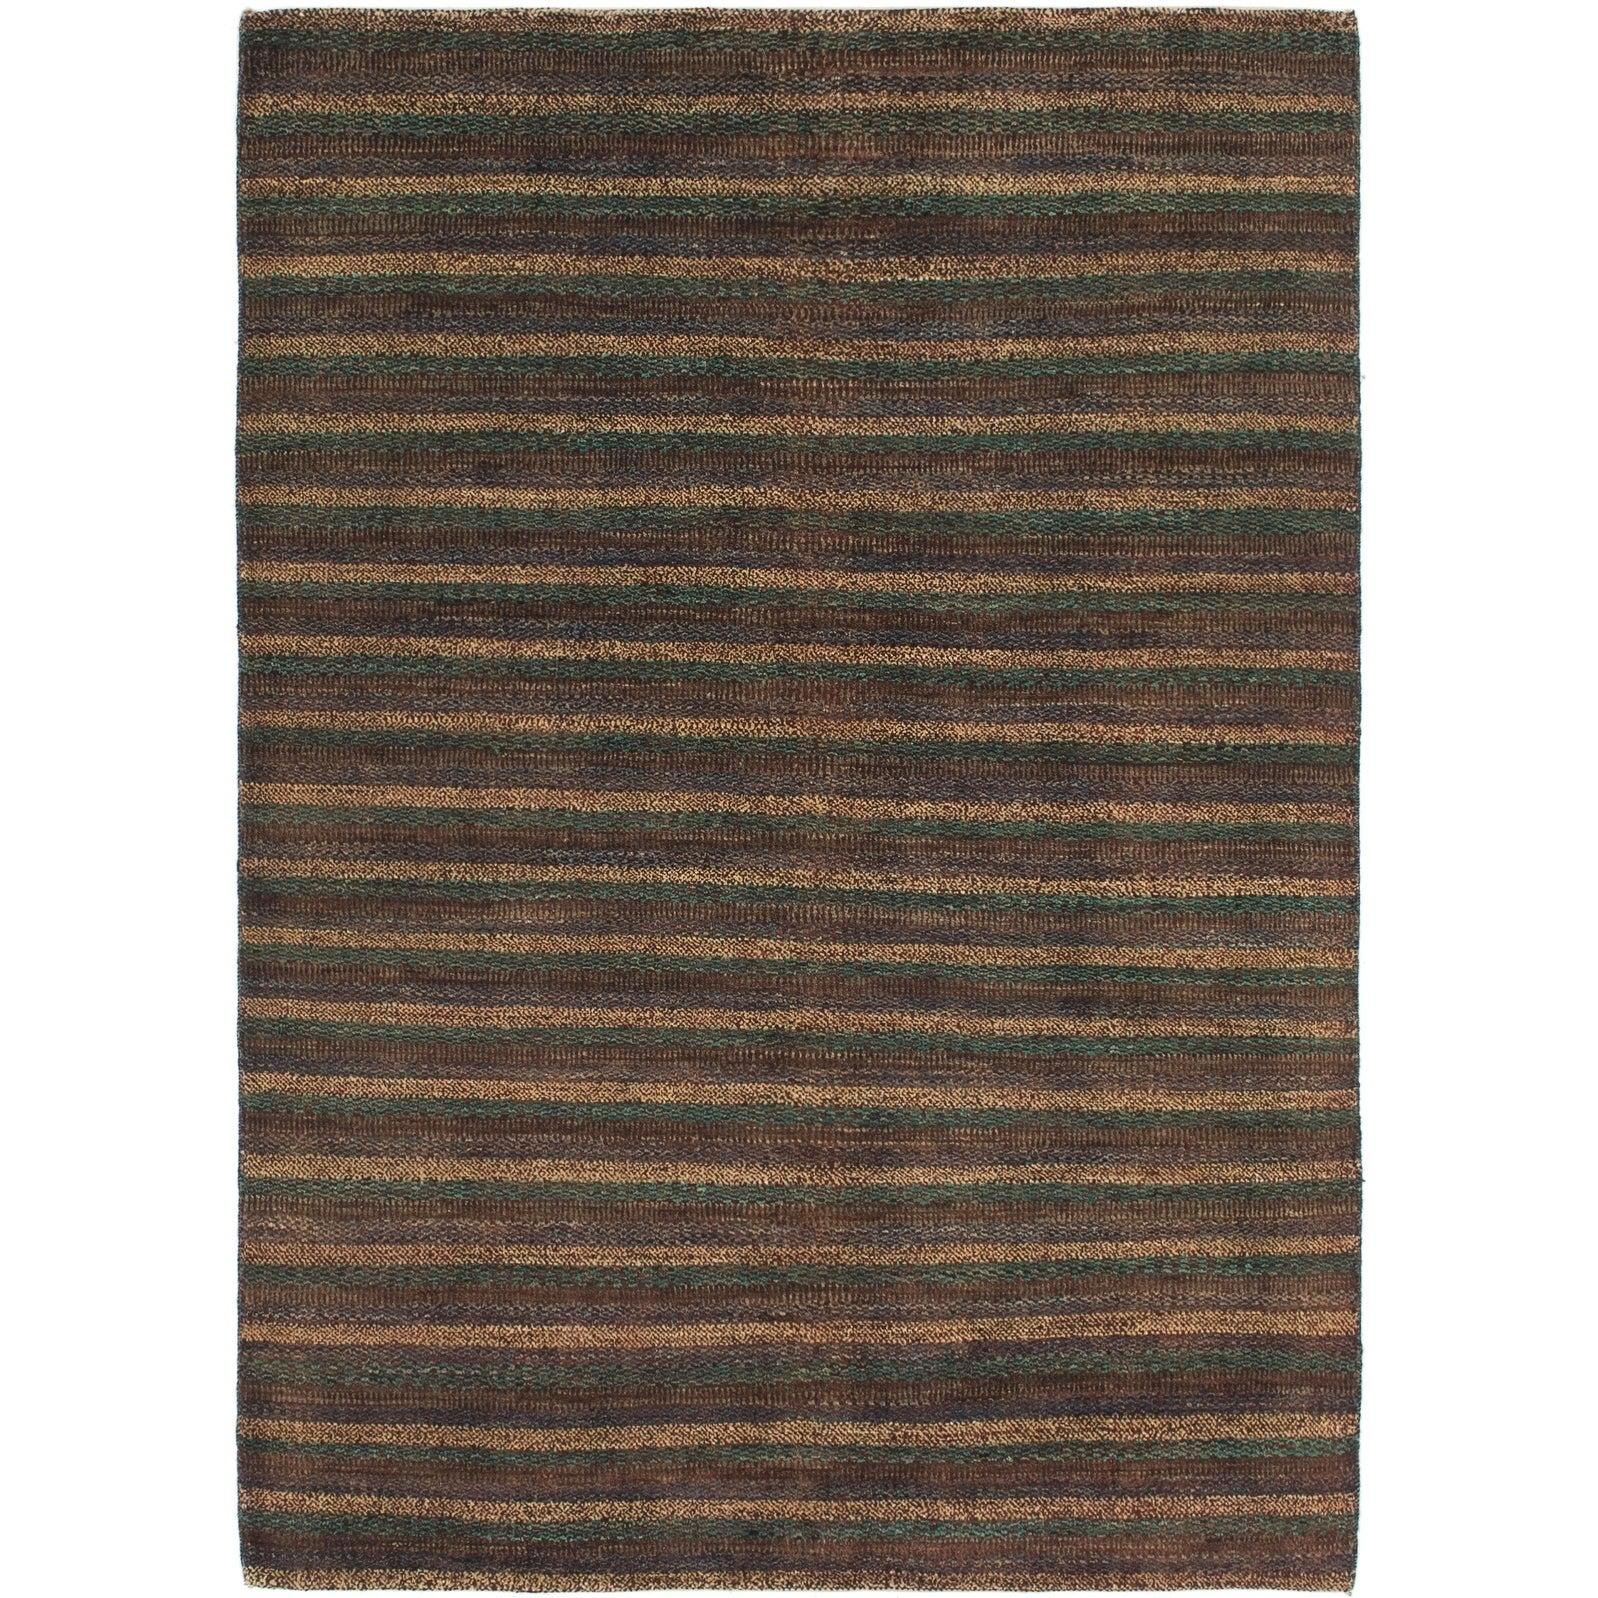 Hand Knotted Kashkuli Gabbeh Wool Area Rug - 4 7 x 6 7 (Brown - 4 7 x 6 7)